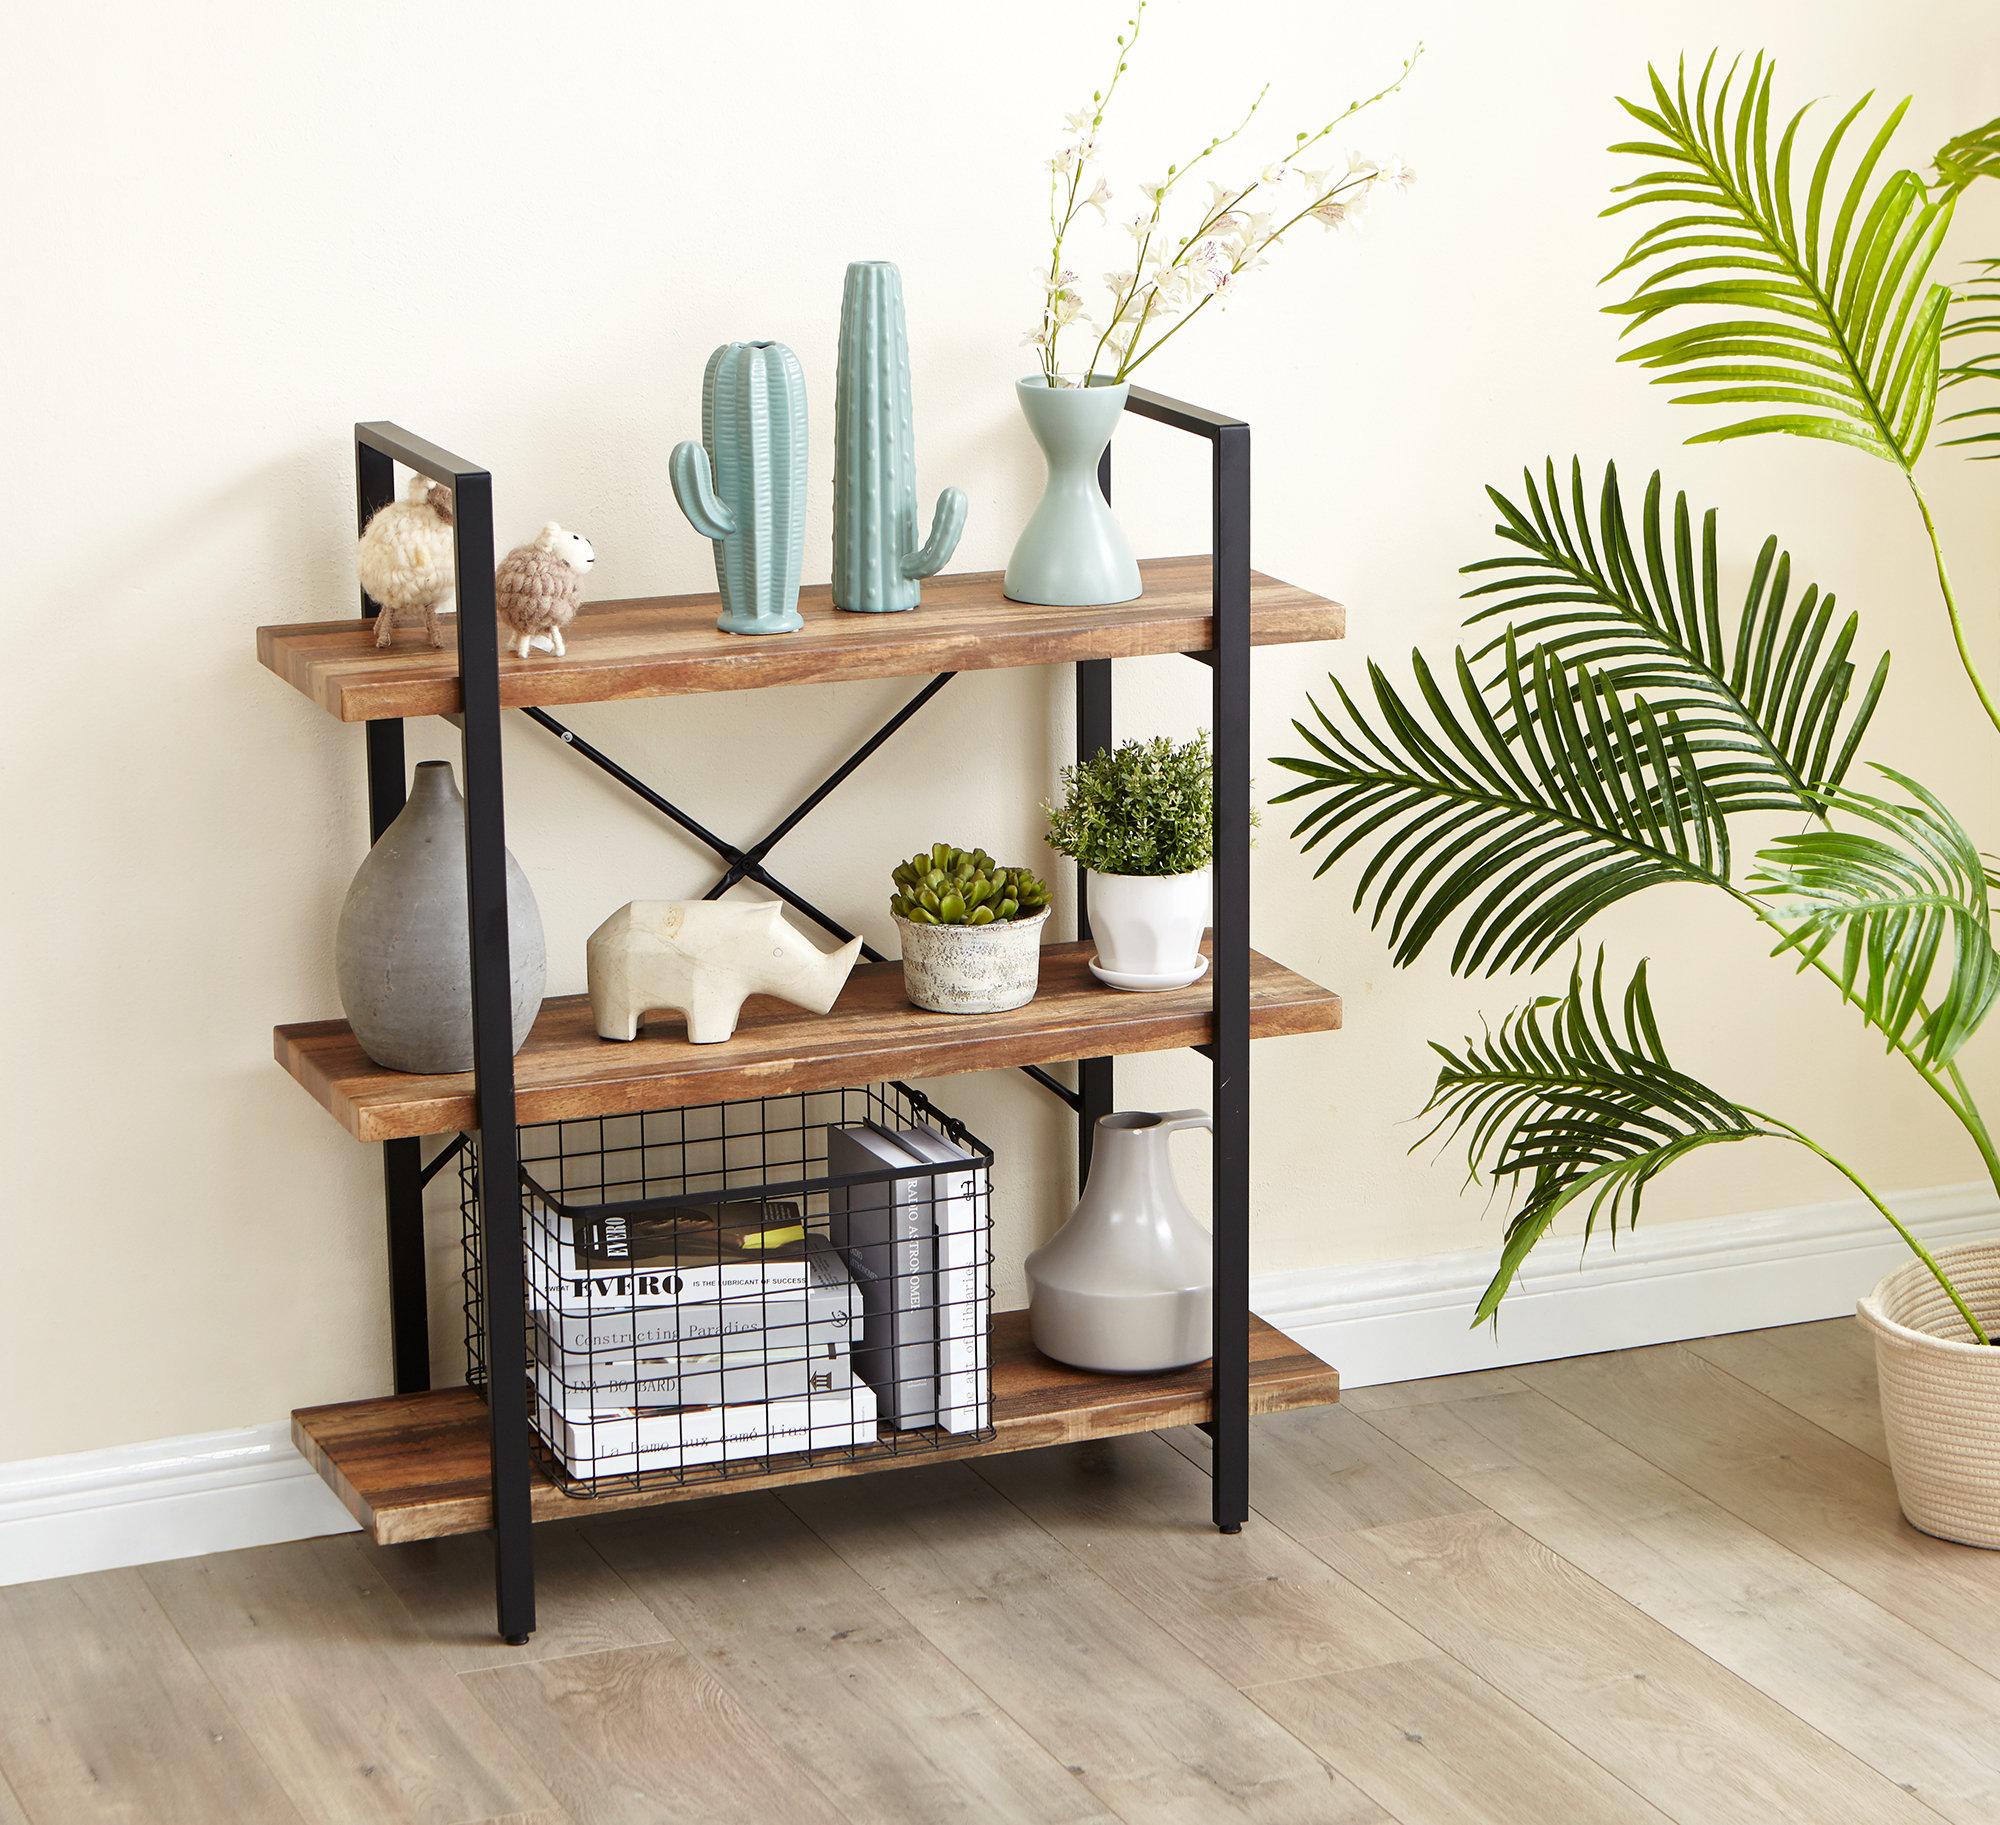 brand new 1f5f3 dc232 Inspirer Studio 3 Tiers Ladder Shelf, Vintage Bookshelf, Storage Rack    Inspirer Studio